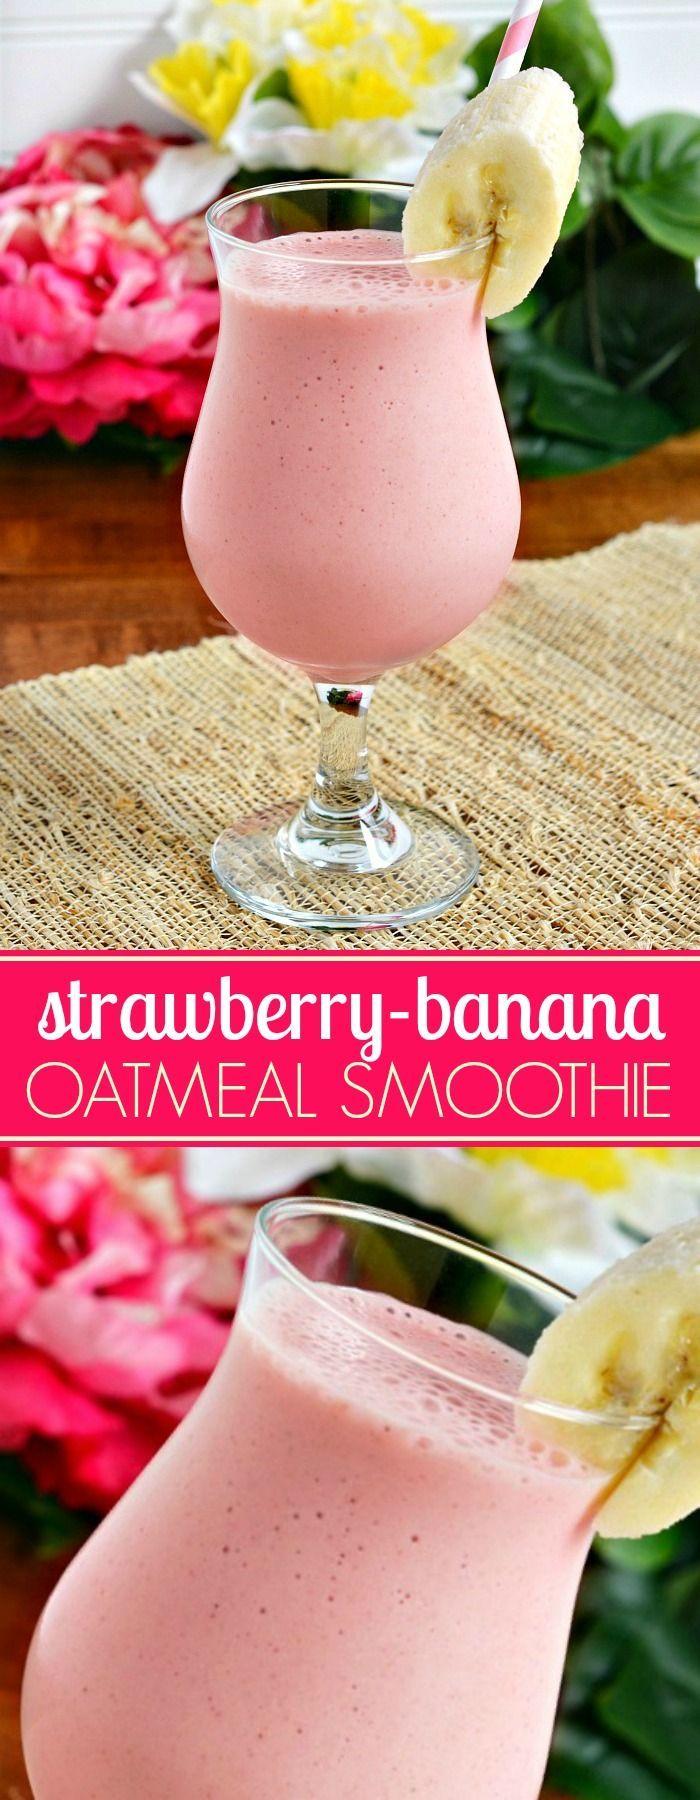 Strawberry Banana Oatmeal Smoothie Recipe